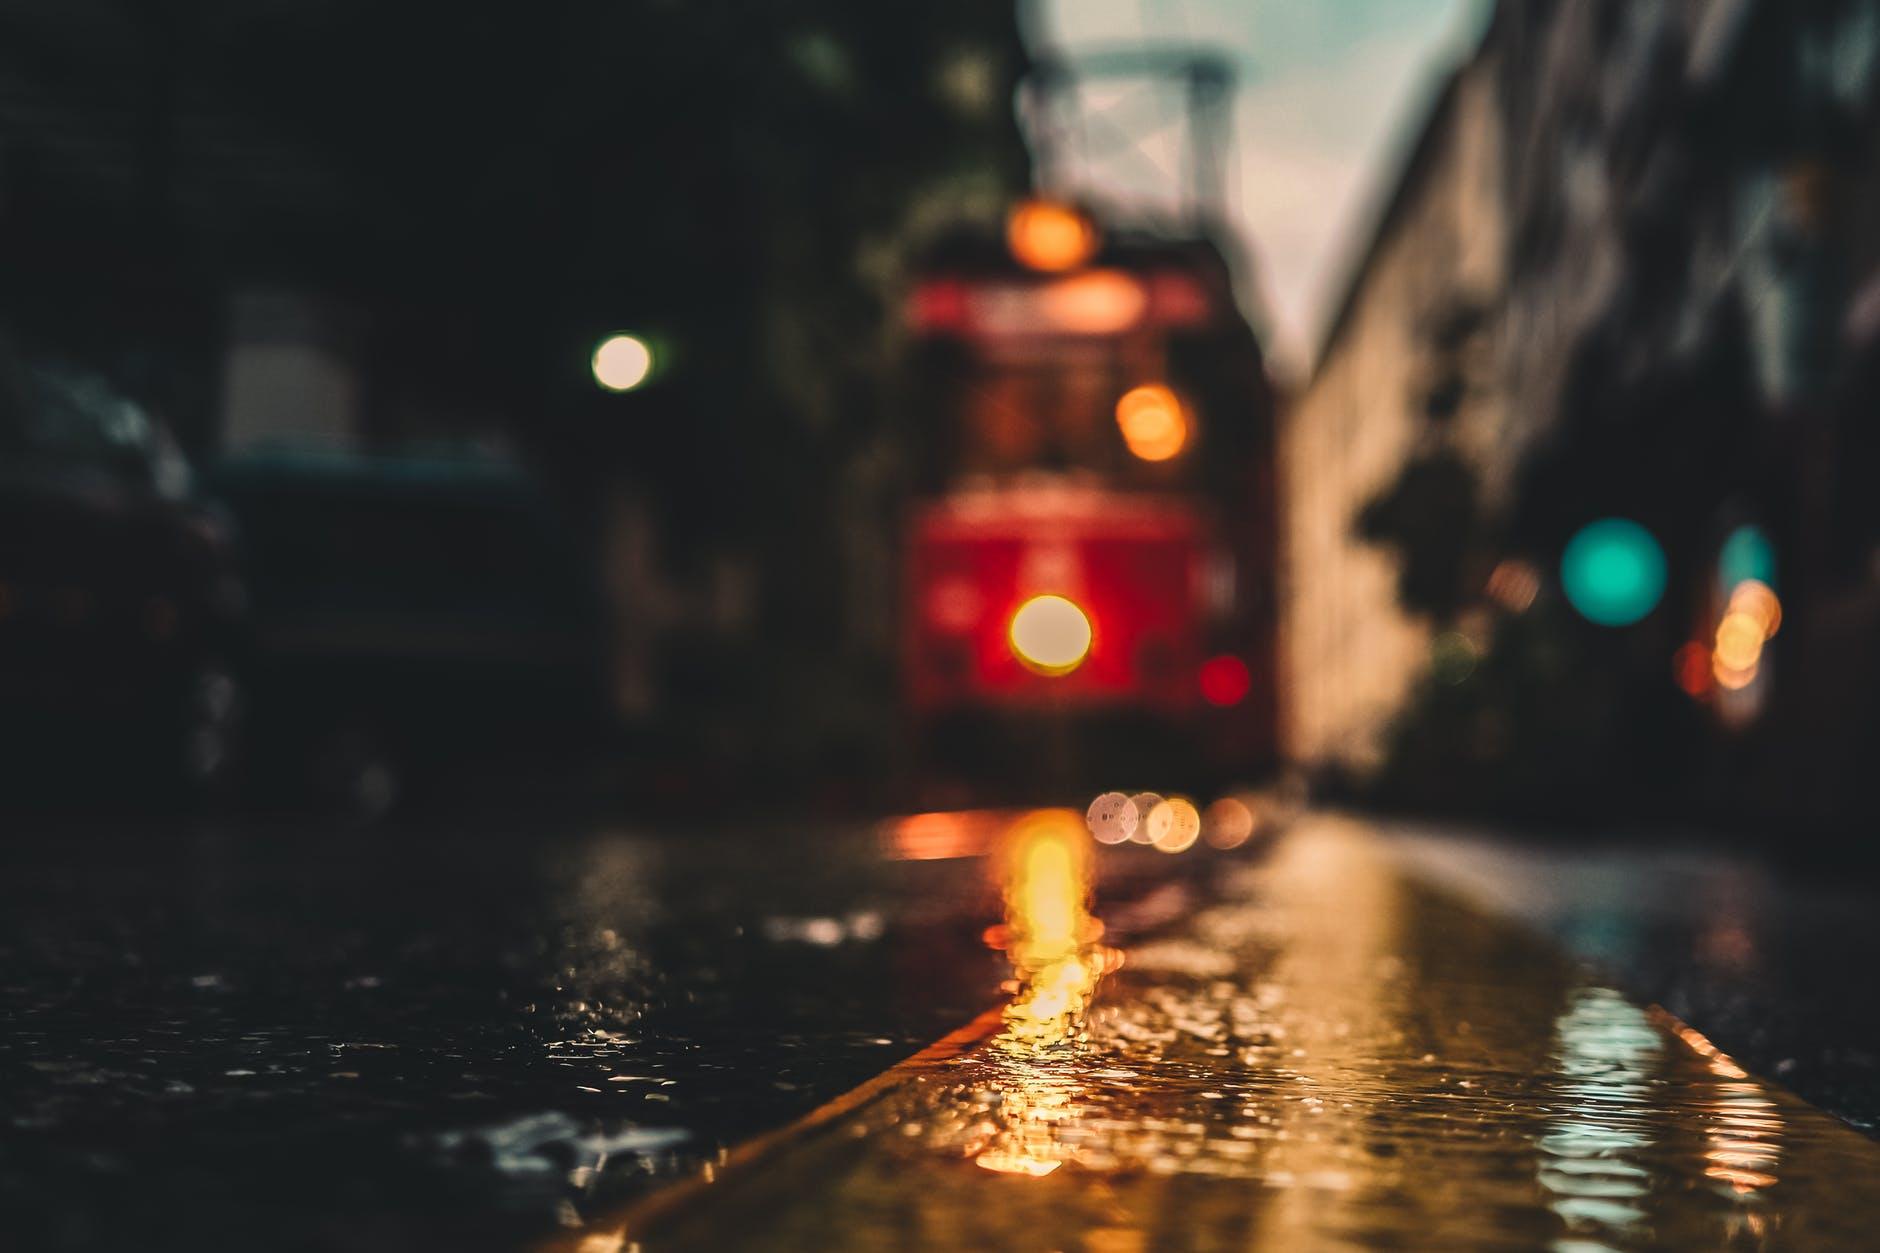 asphalt blur blurred blurry